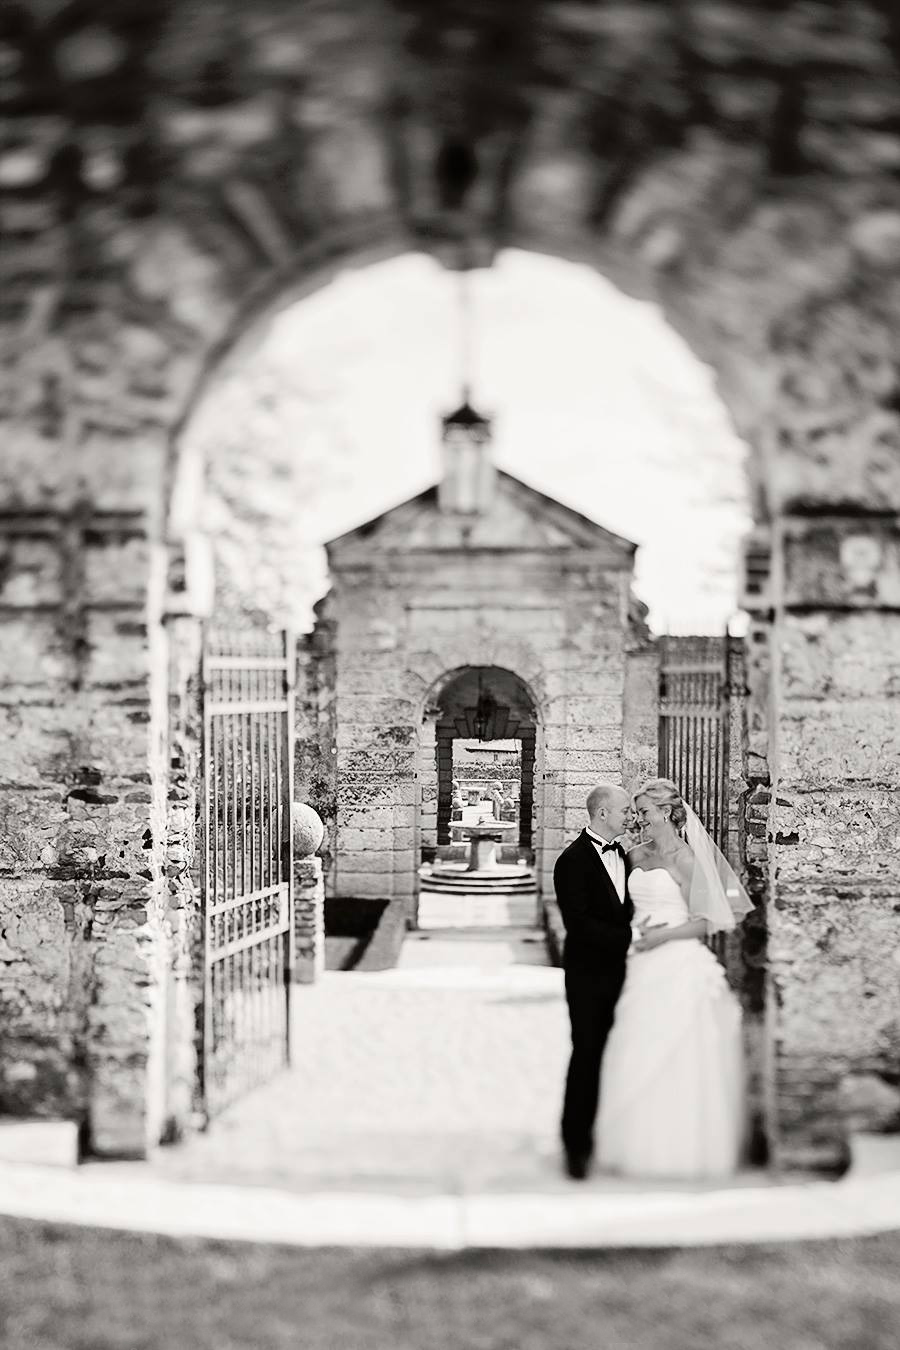 Susanne & Marcus - Villa della Torre in Valpolicella, Italy